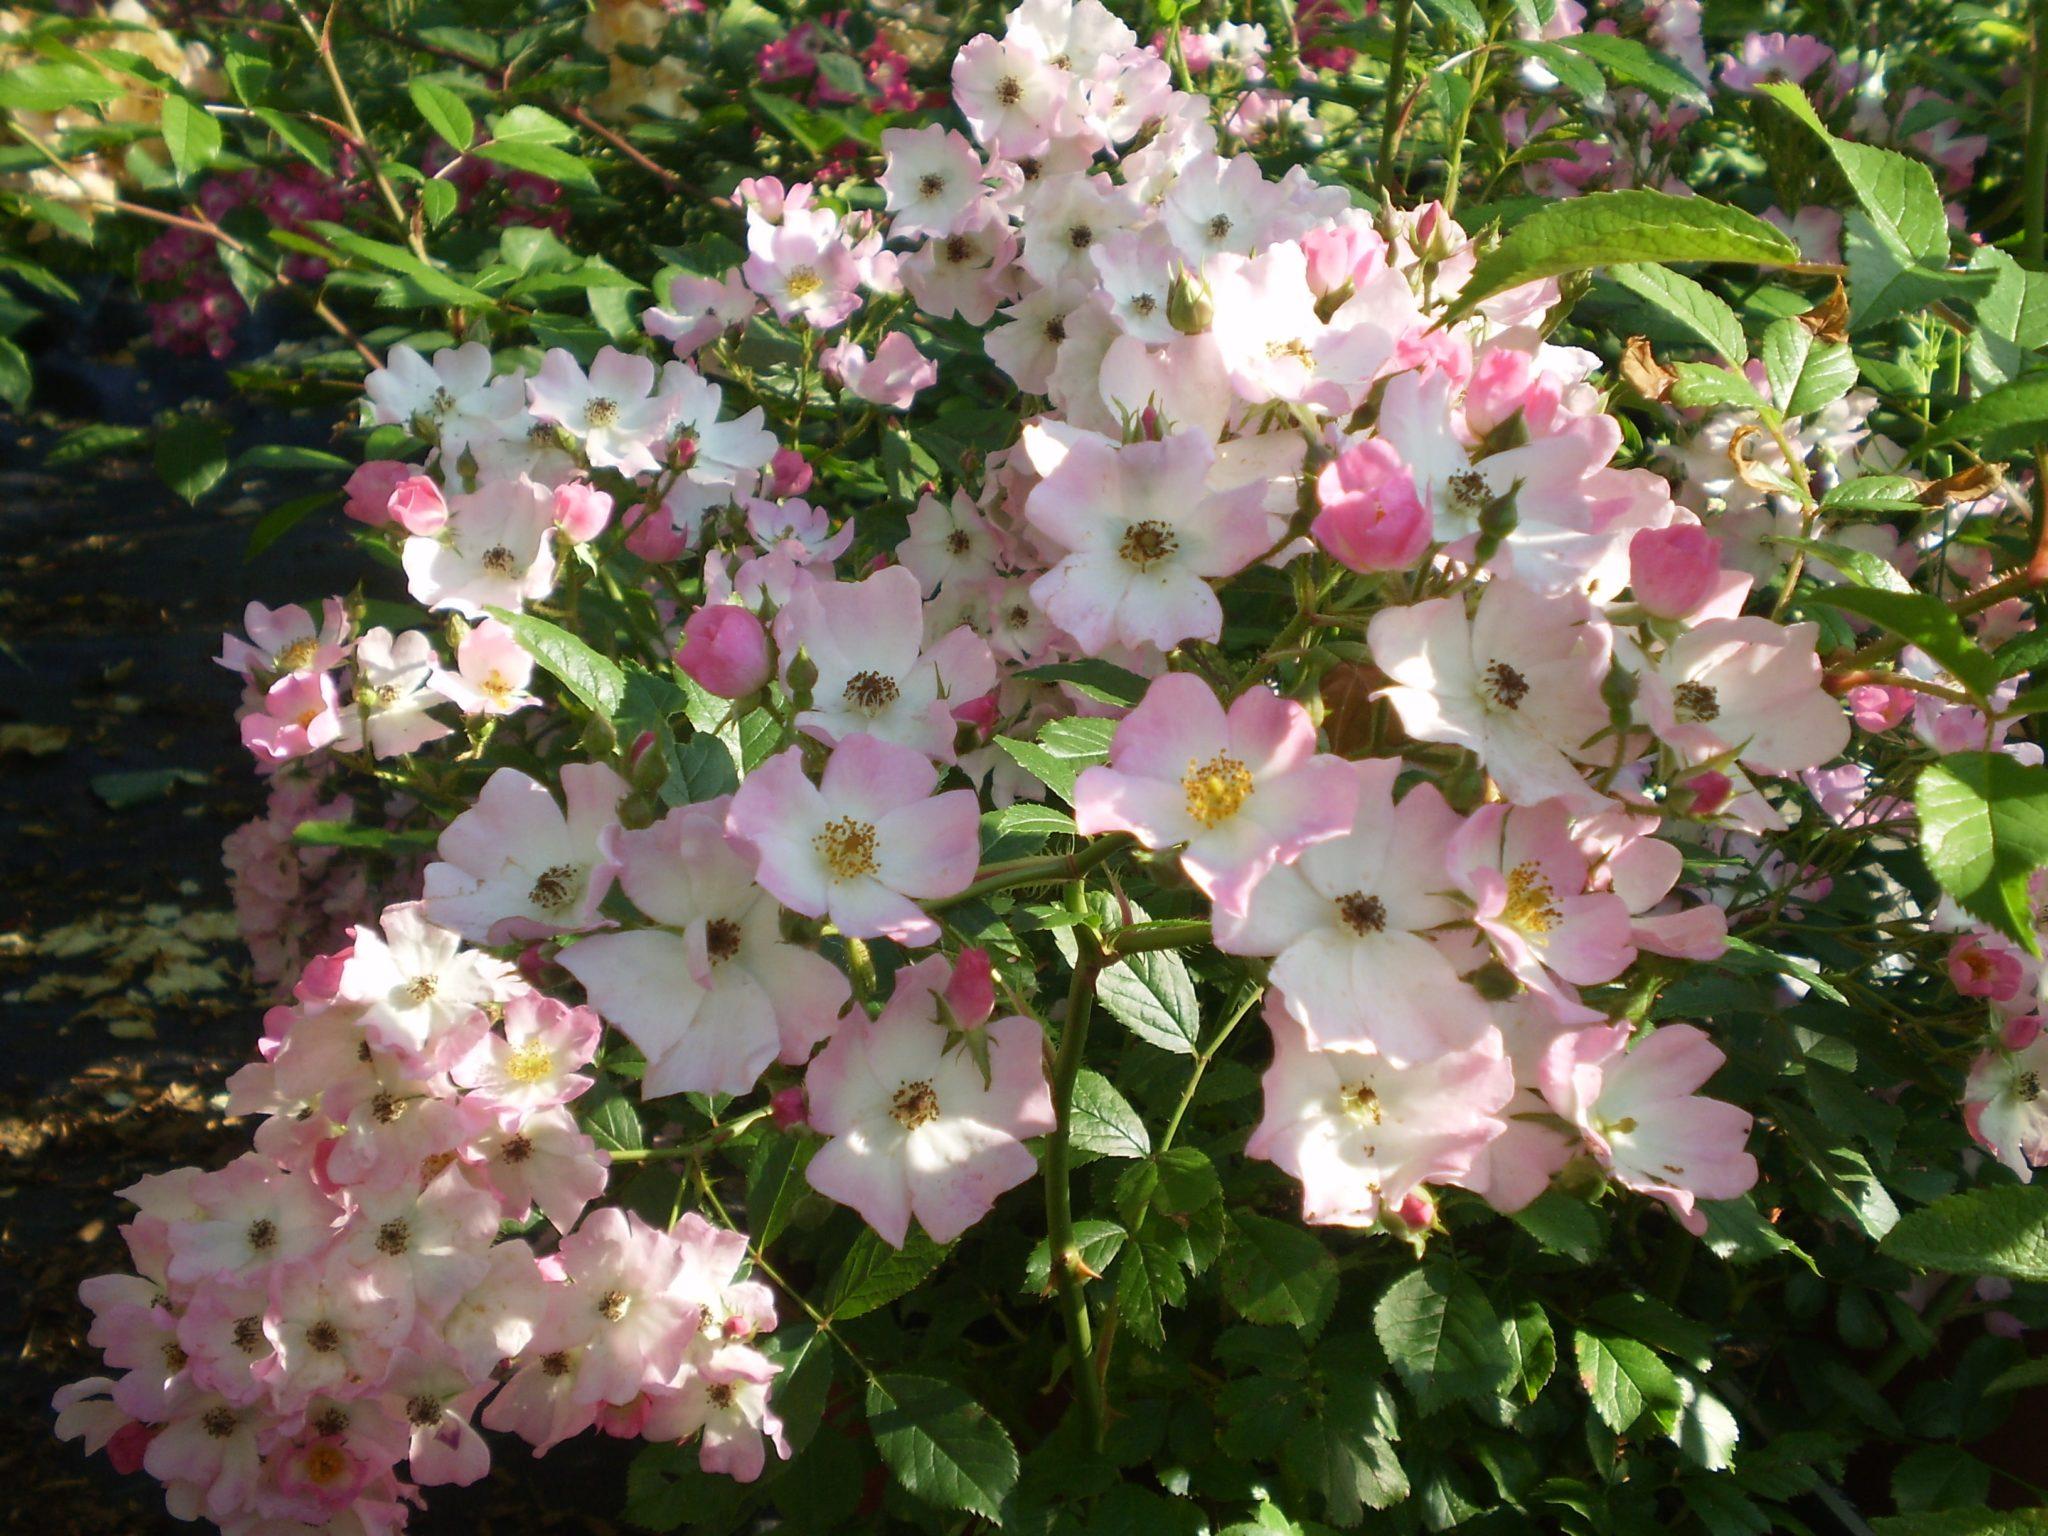 Rose Rampicanti Senza Spine ballerina clg. rosa rampicante 2-5 metri